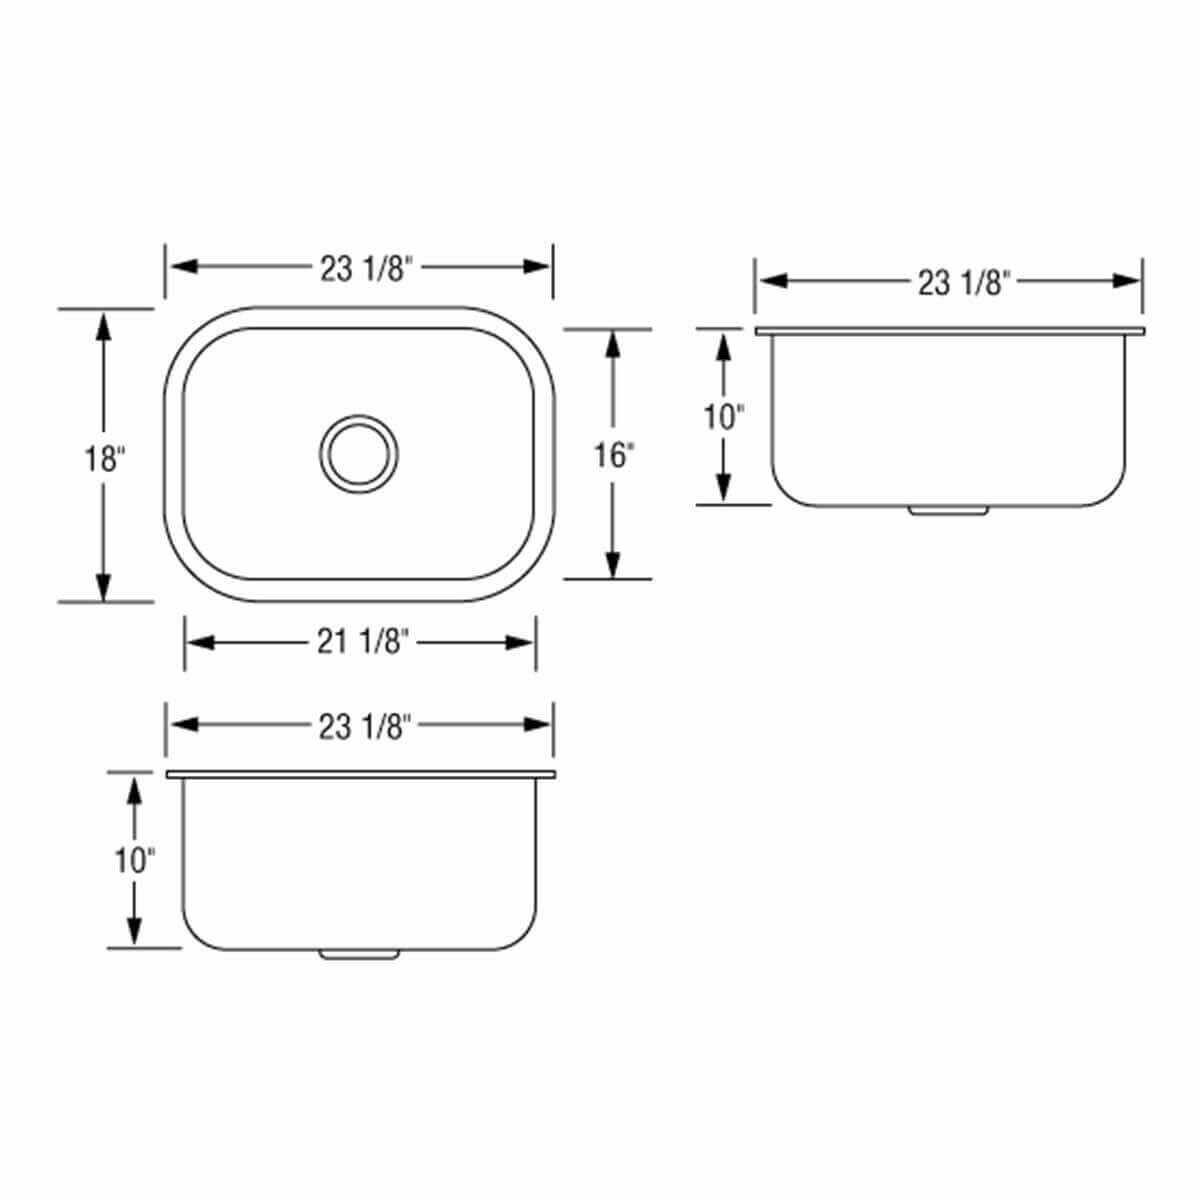 AR2318D10-D Artisan Single Bowl Sink Dimensions